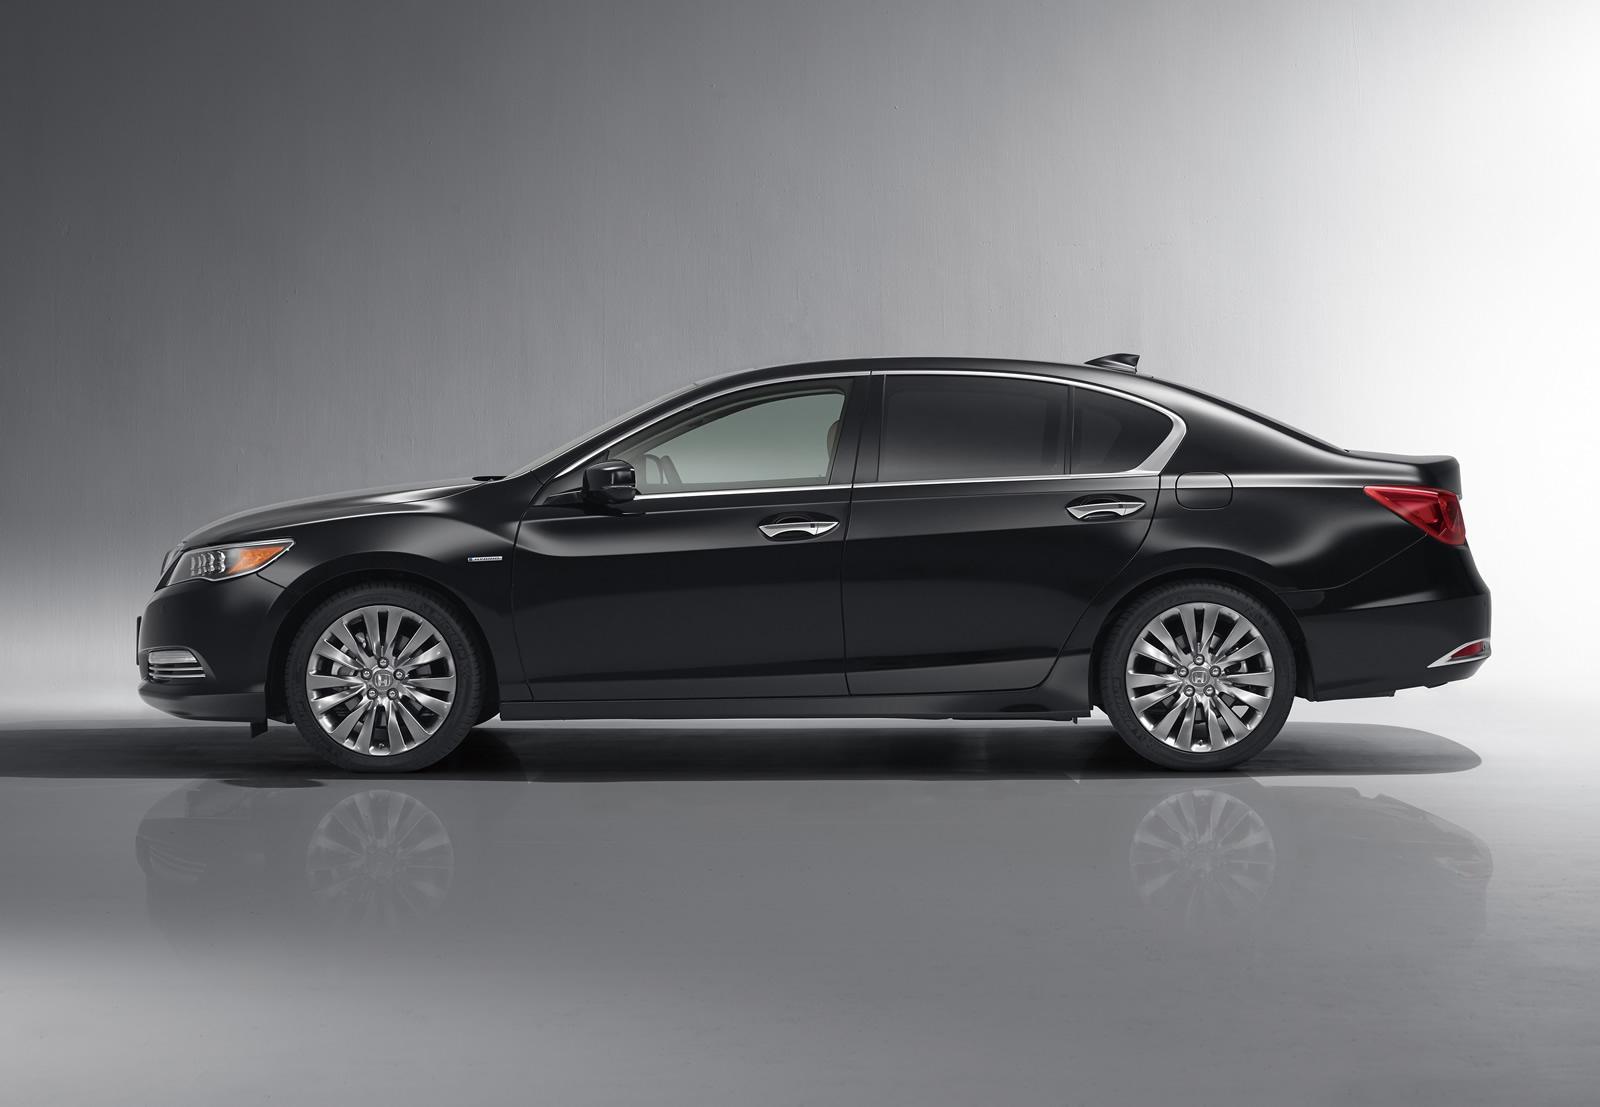 honda cars news 2015 honda legend unveiled gets hybrid drivetrain. Black Bedroom Furniture Sets. Home Design Ideas